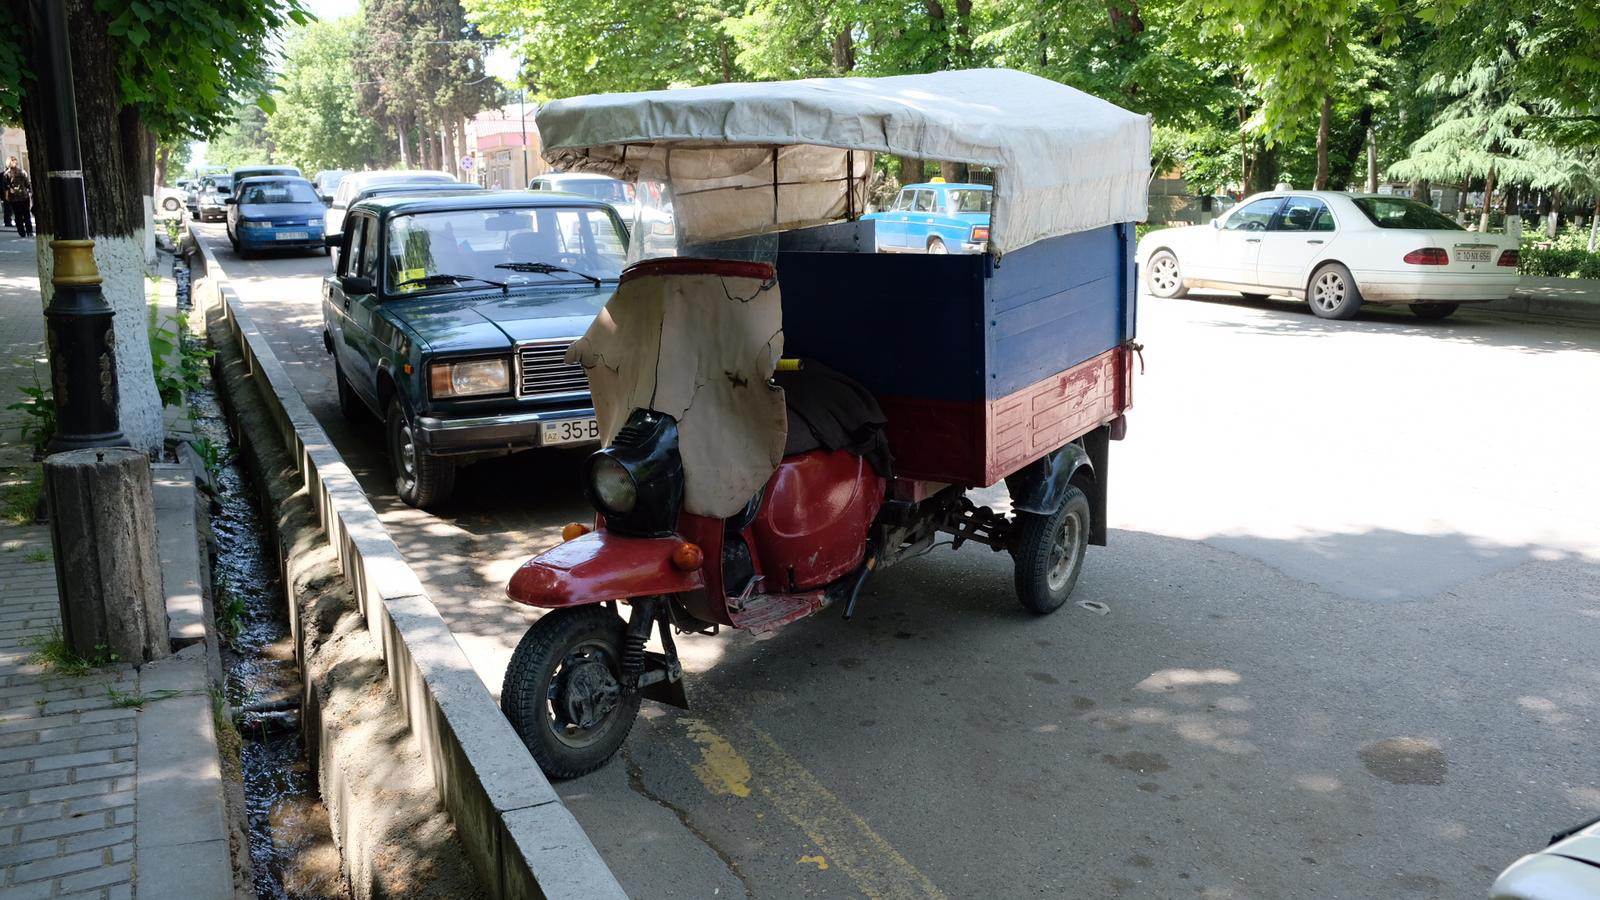 Qazax - Ankunft in Aserbaidschan